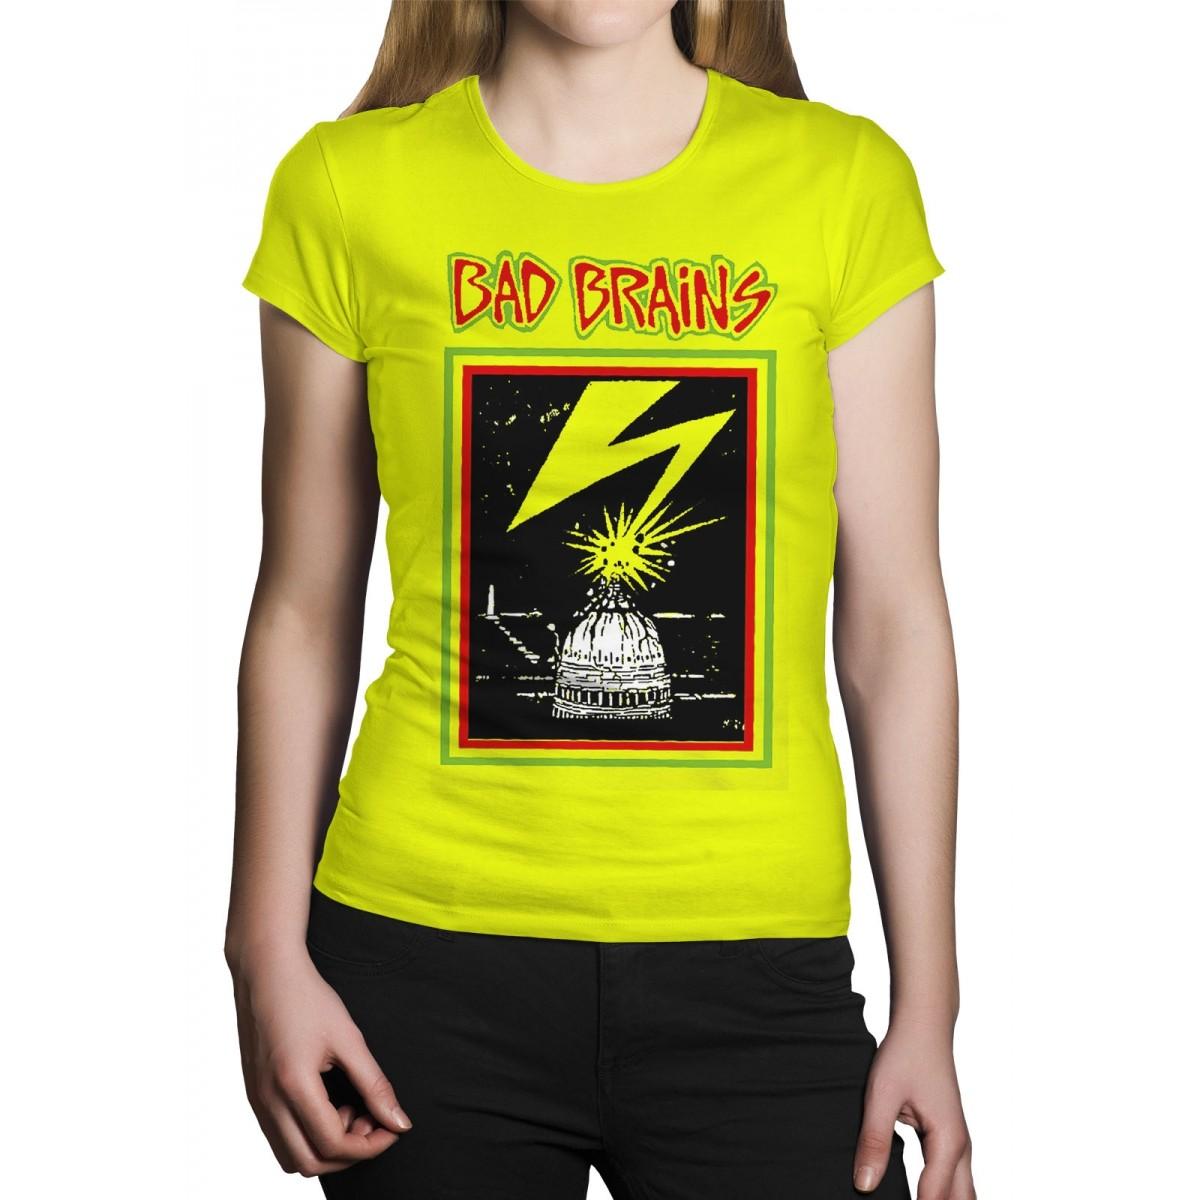 Camiseta Bad Brains - Escolha a Cor  - HShop